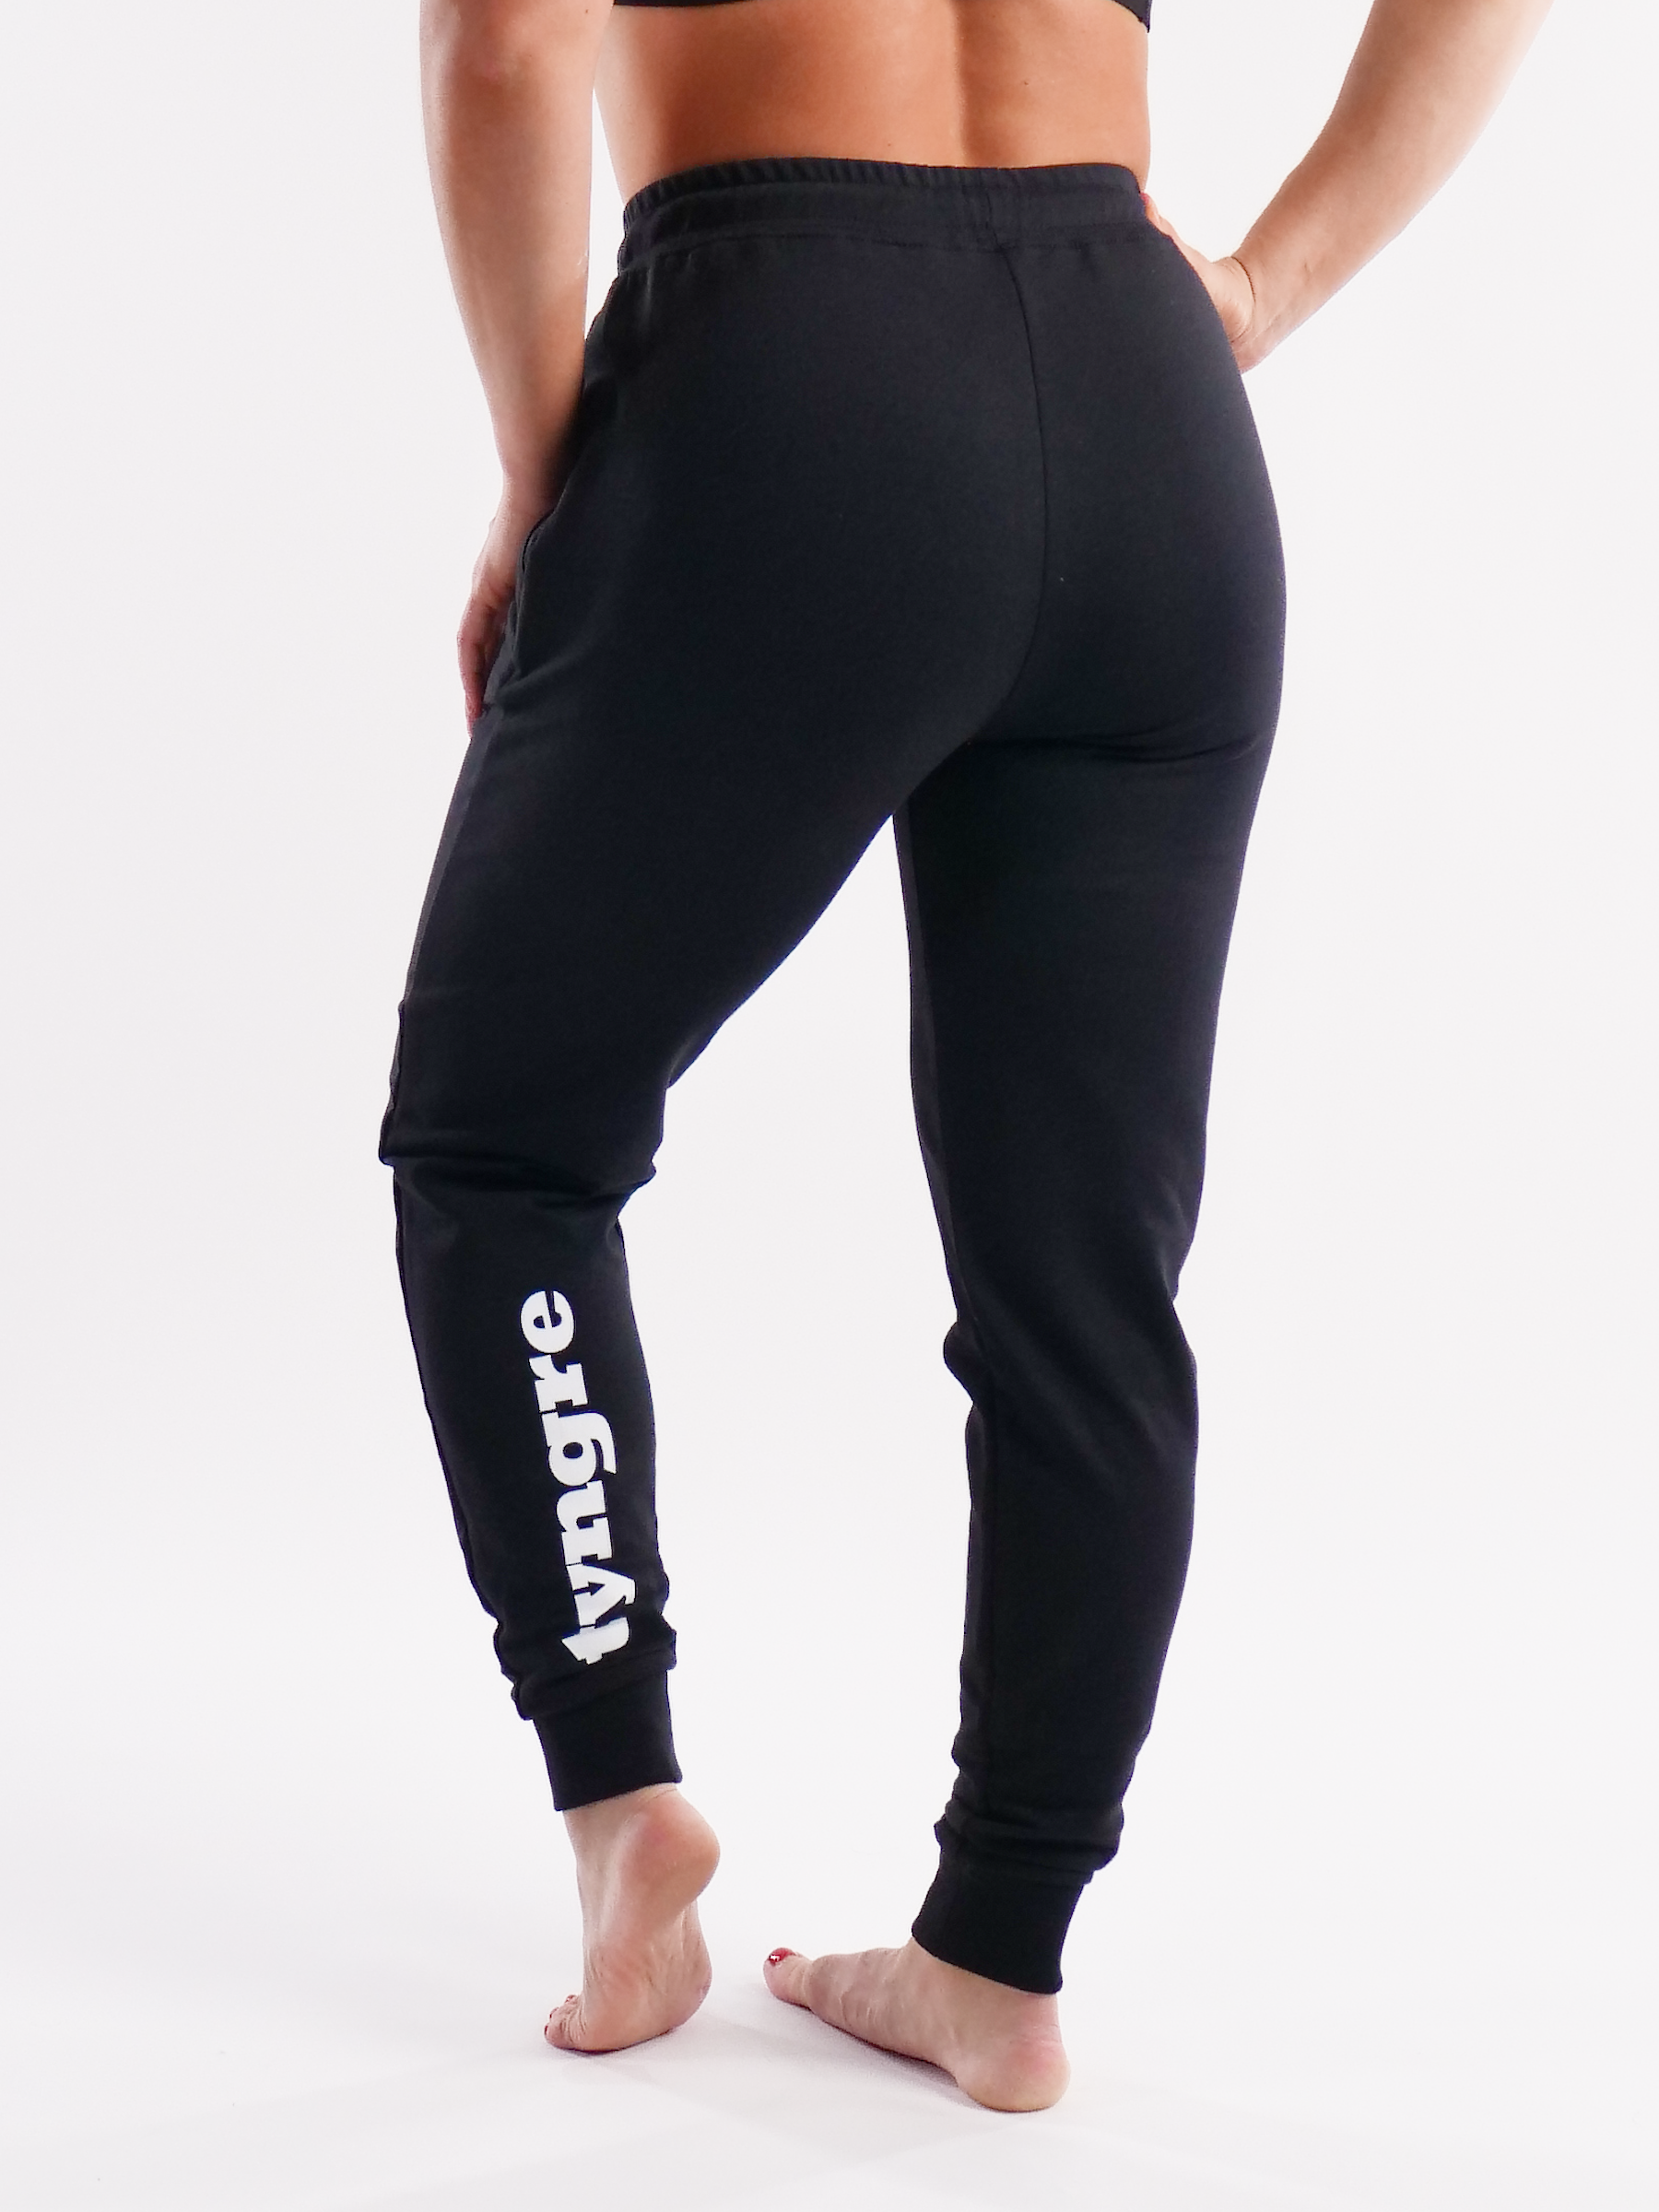 Sweatpants Work Womens Black